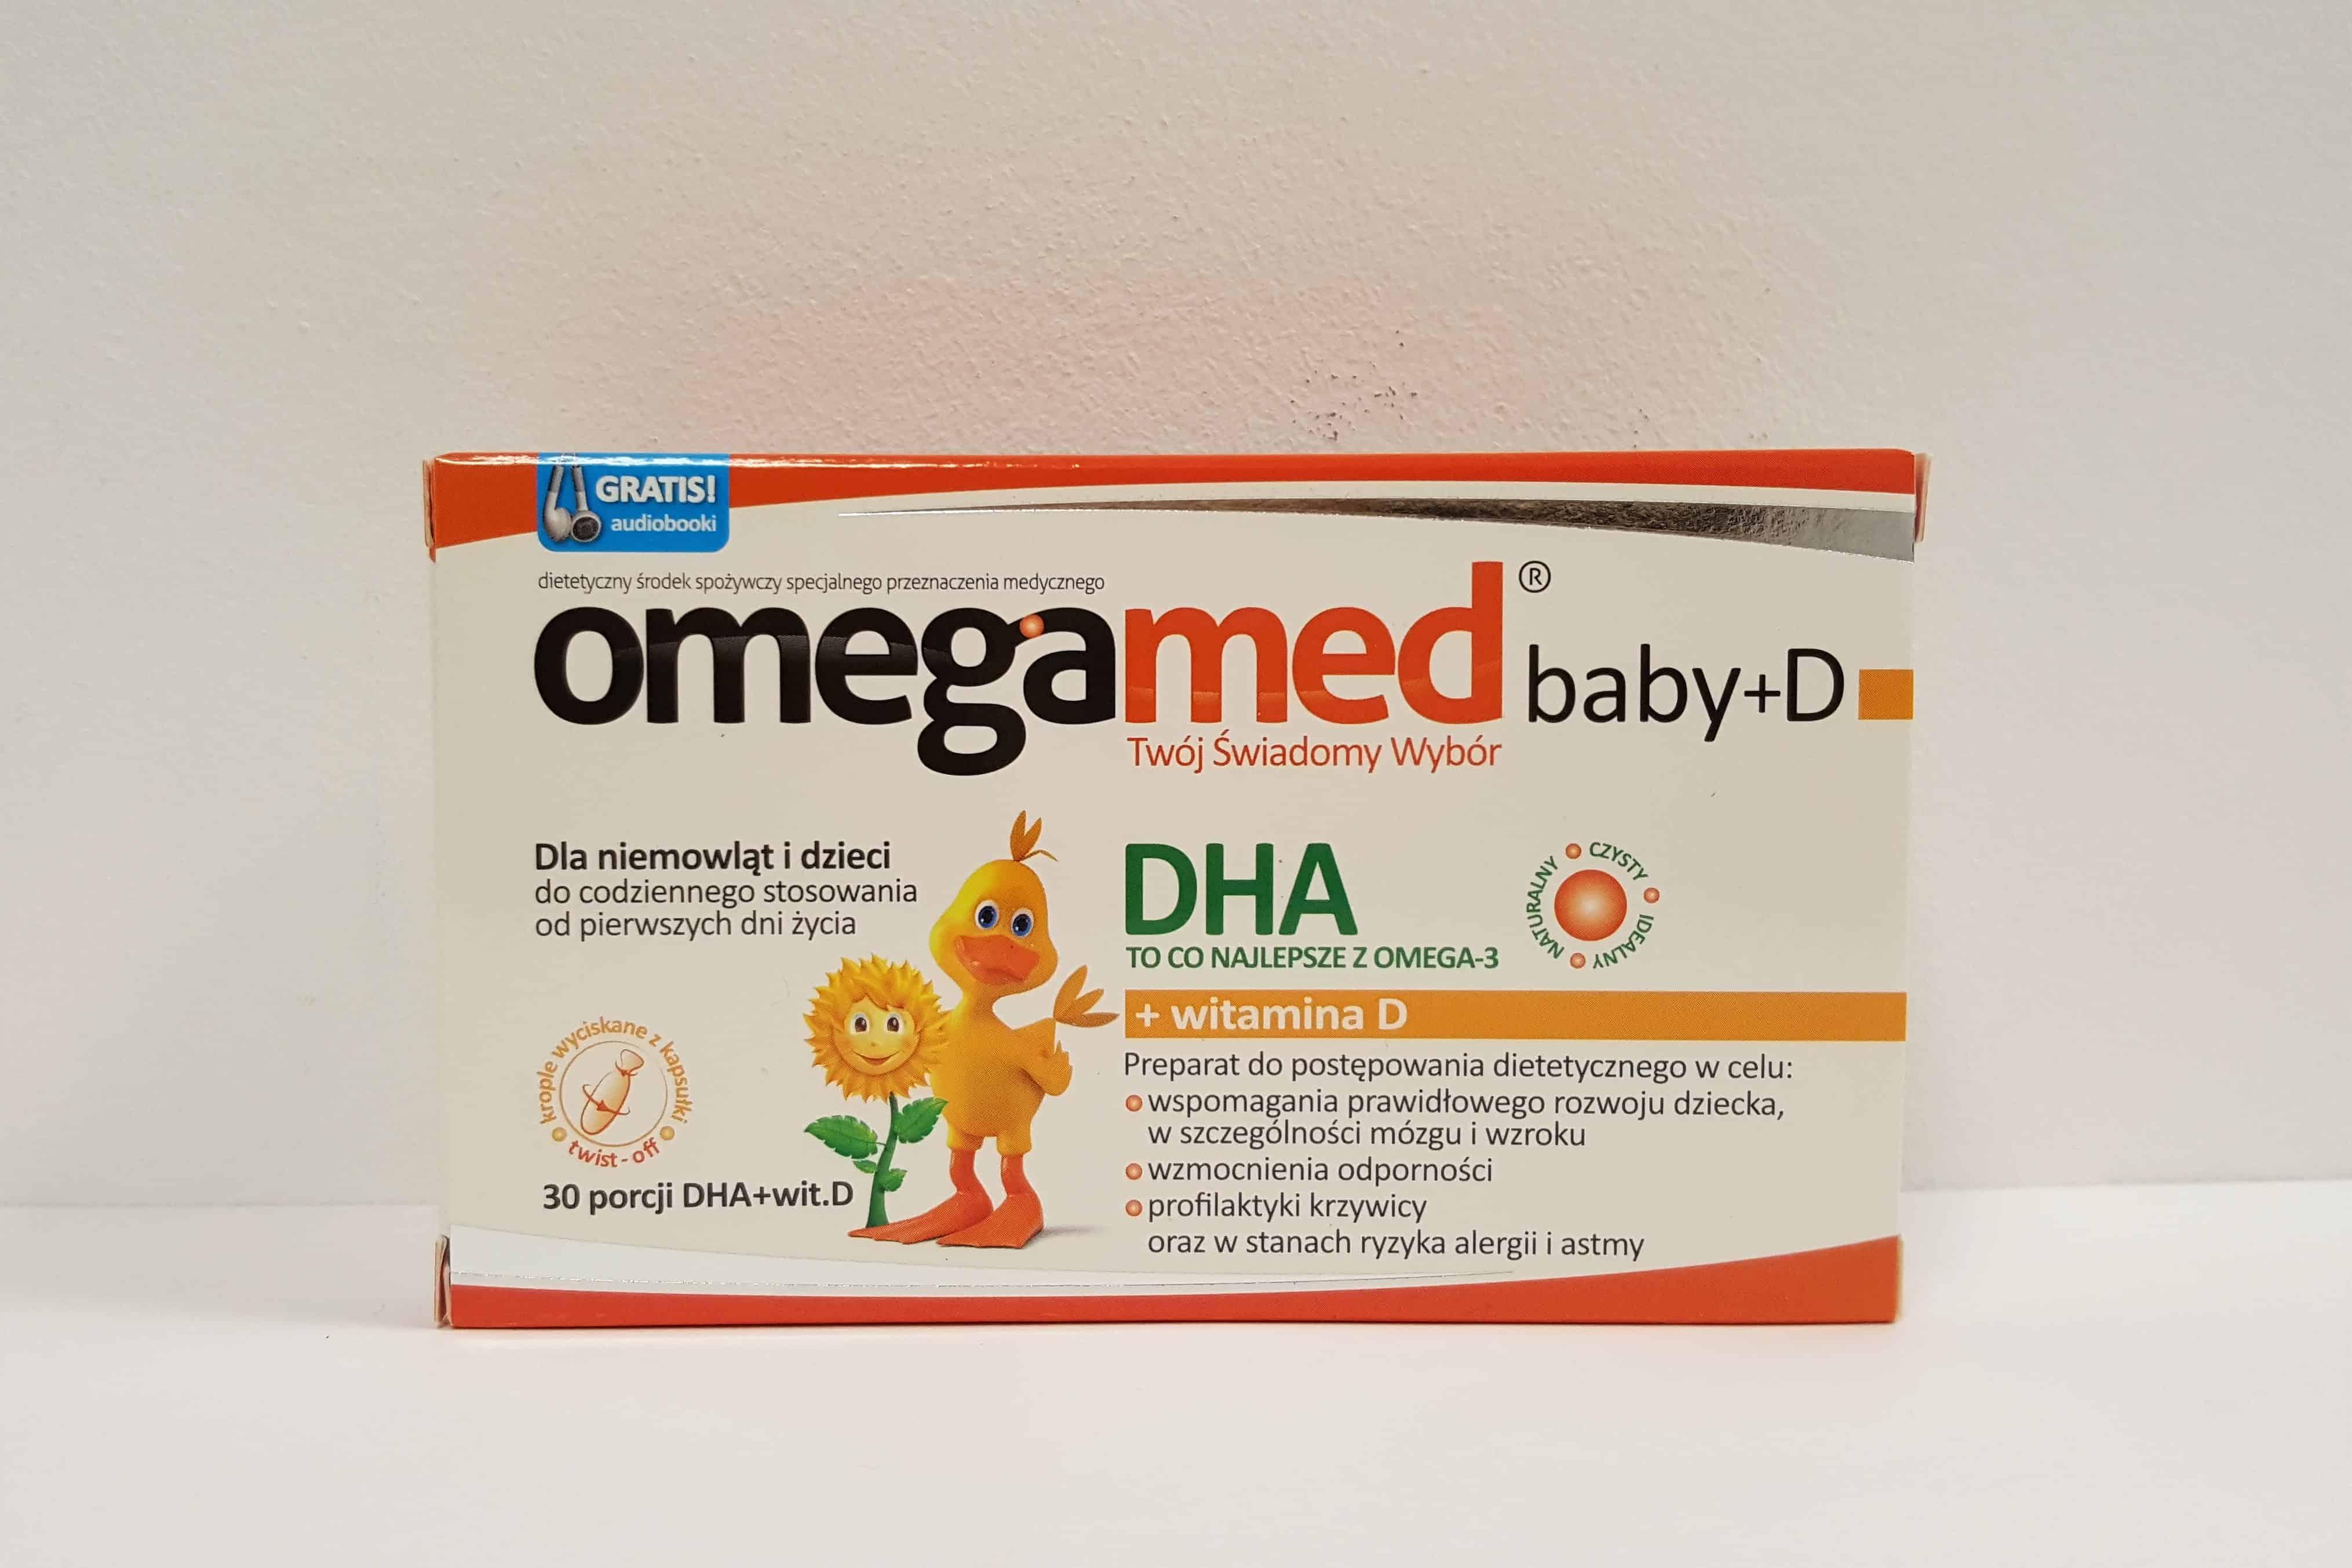 Omegamed baby+D twist off Matka Aptekarka